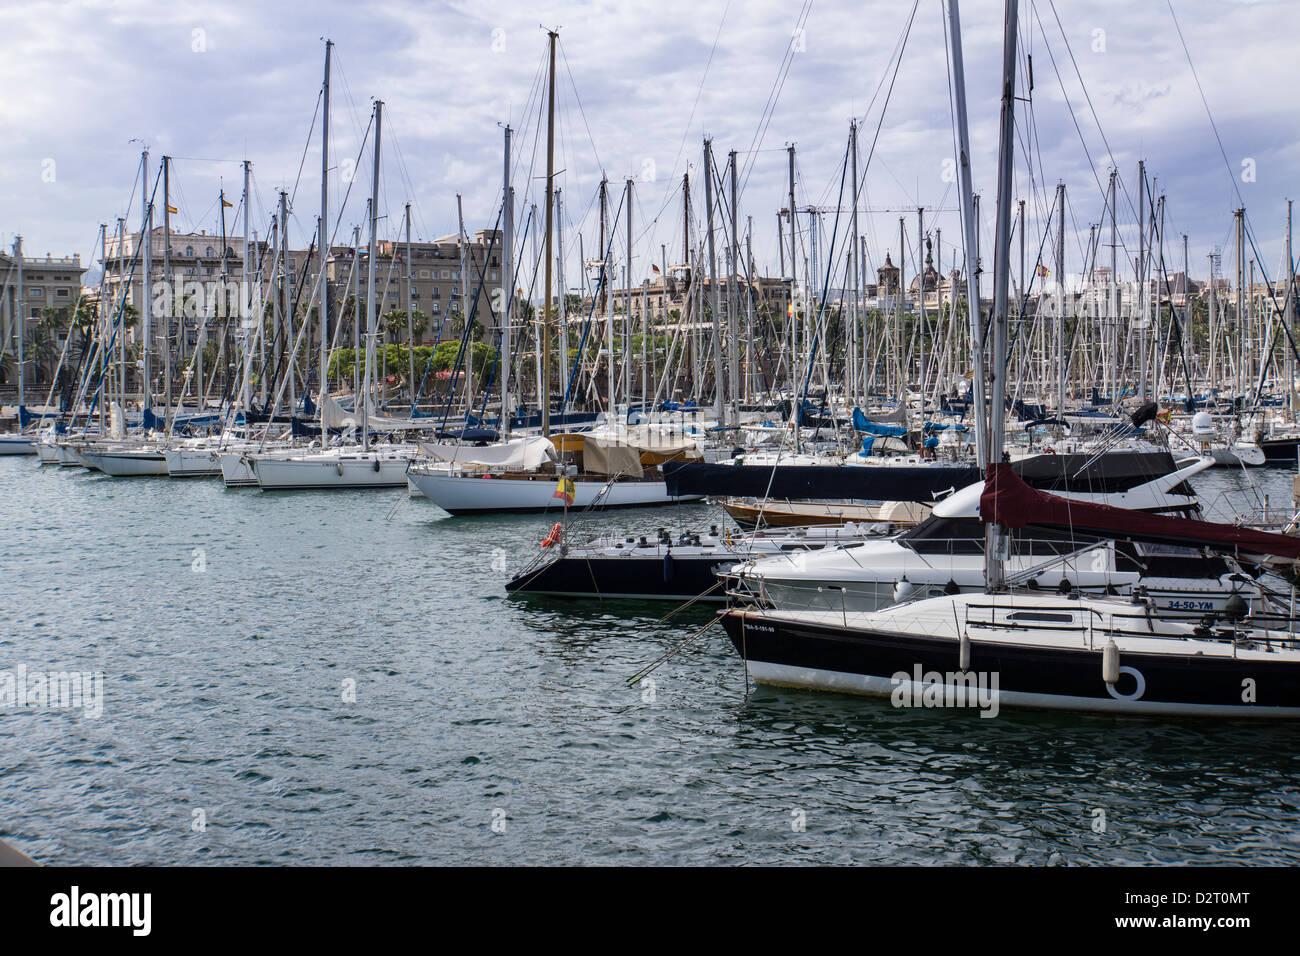 Sailboats in Barcelona harbor Port Vell - Stock Image